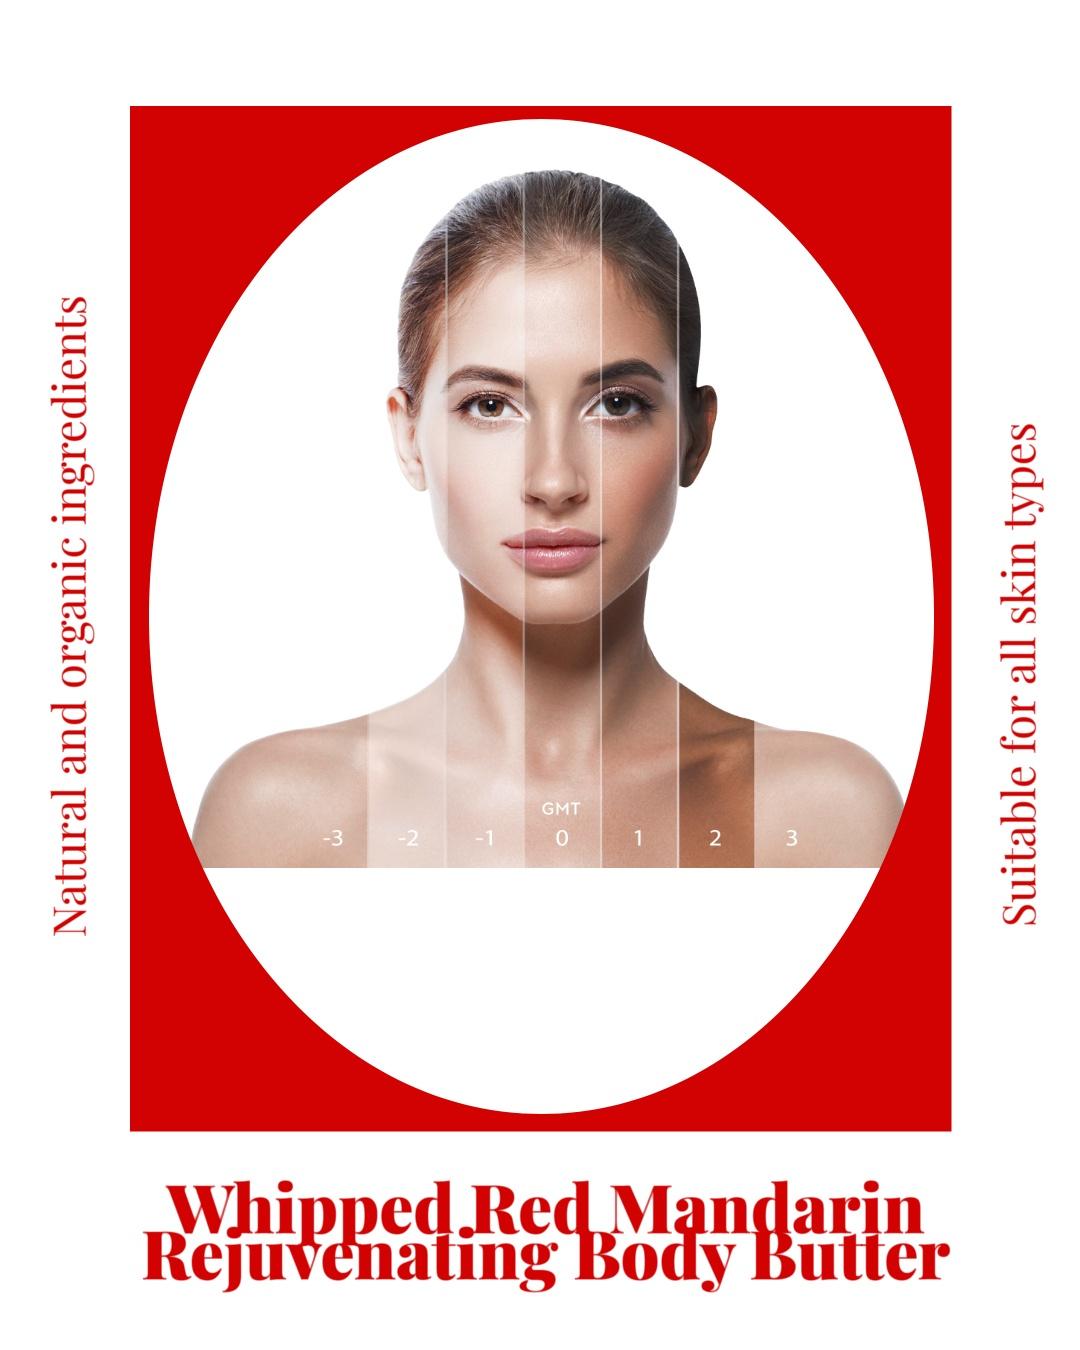 Whipped Red Mandarin Rejuvenating Body Butter Kind Shop 2